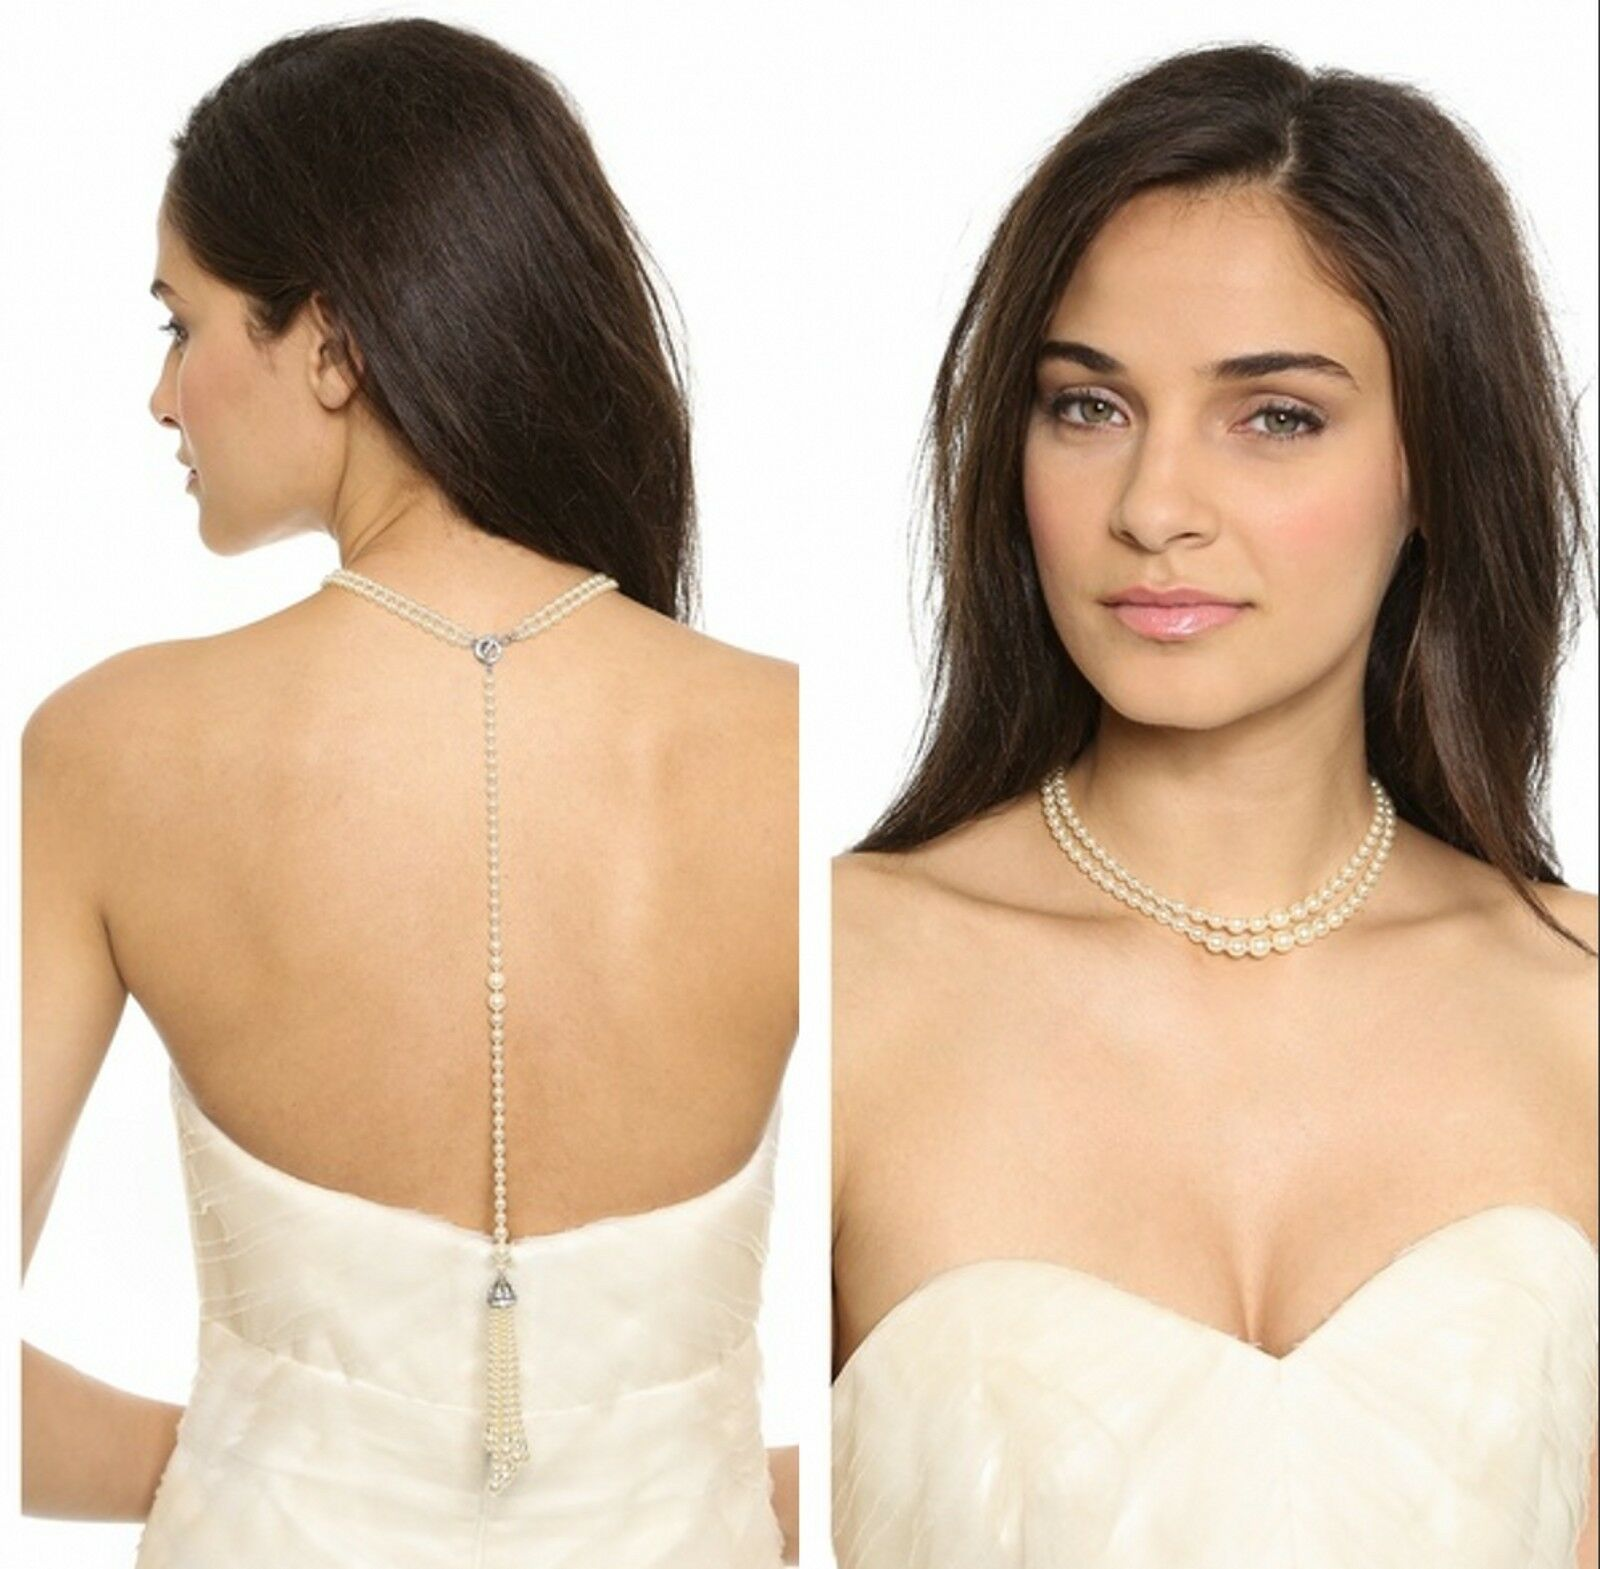 Halskette dos Perle Perlmutt Kleid golden Class Kristall Original Ehe Braut jd 3